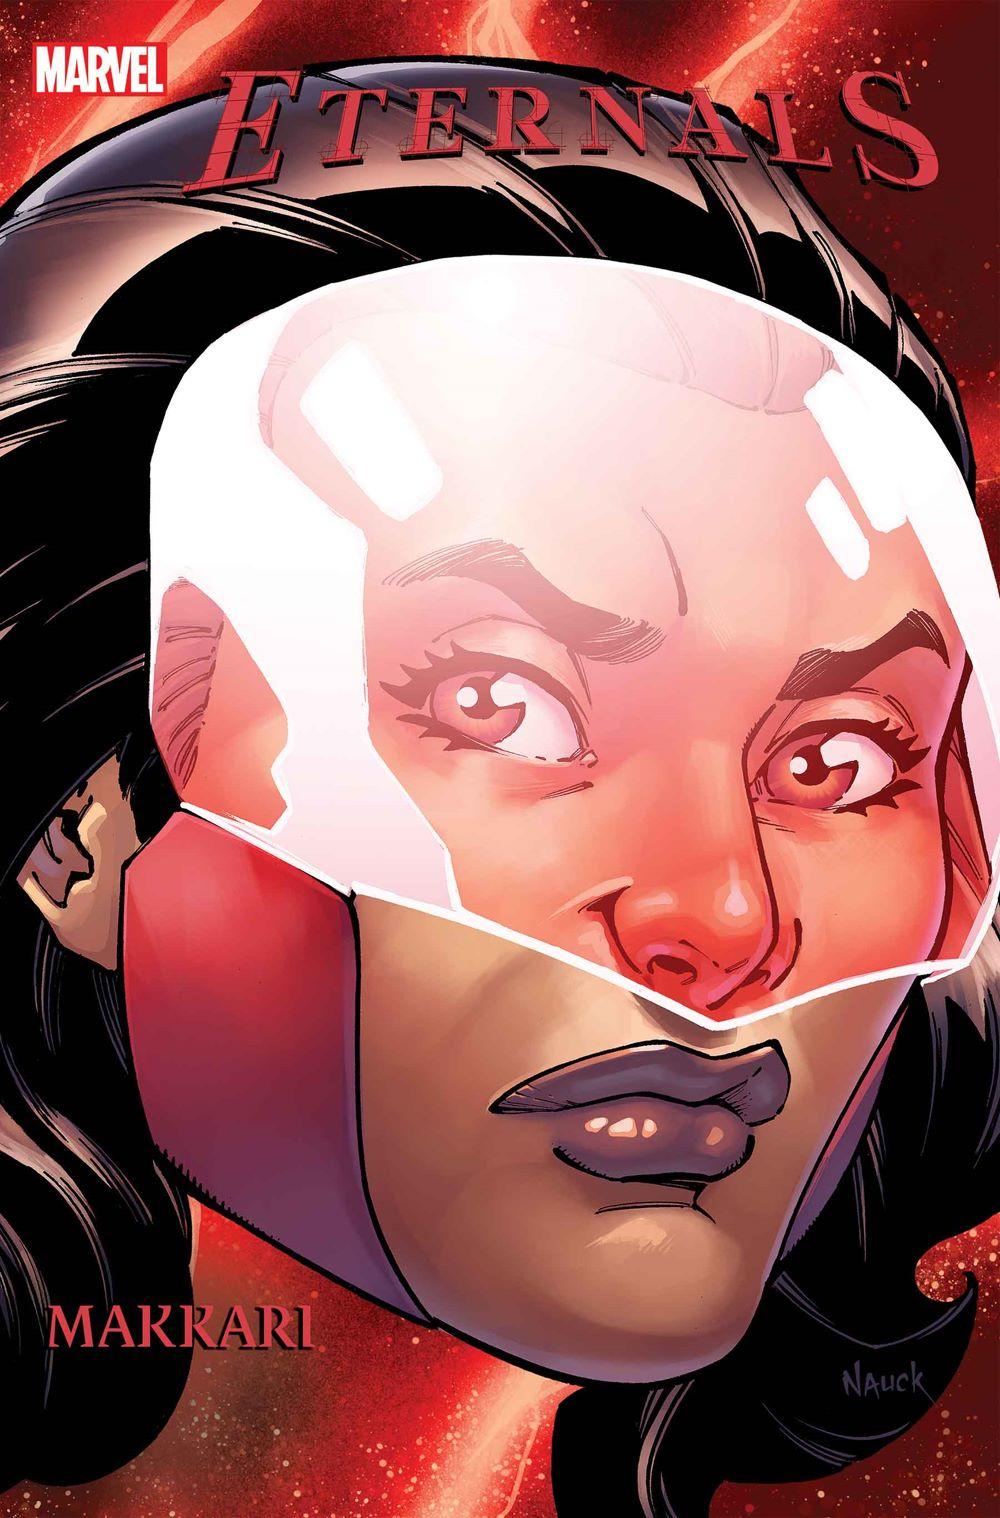 ETRNLS2020003_NAUCK_makkari Marvel Comics January 2021 Solicitations